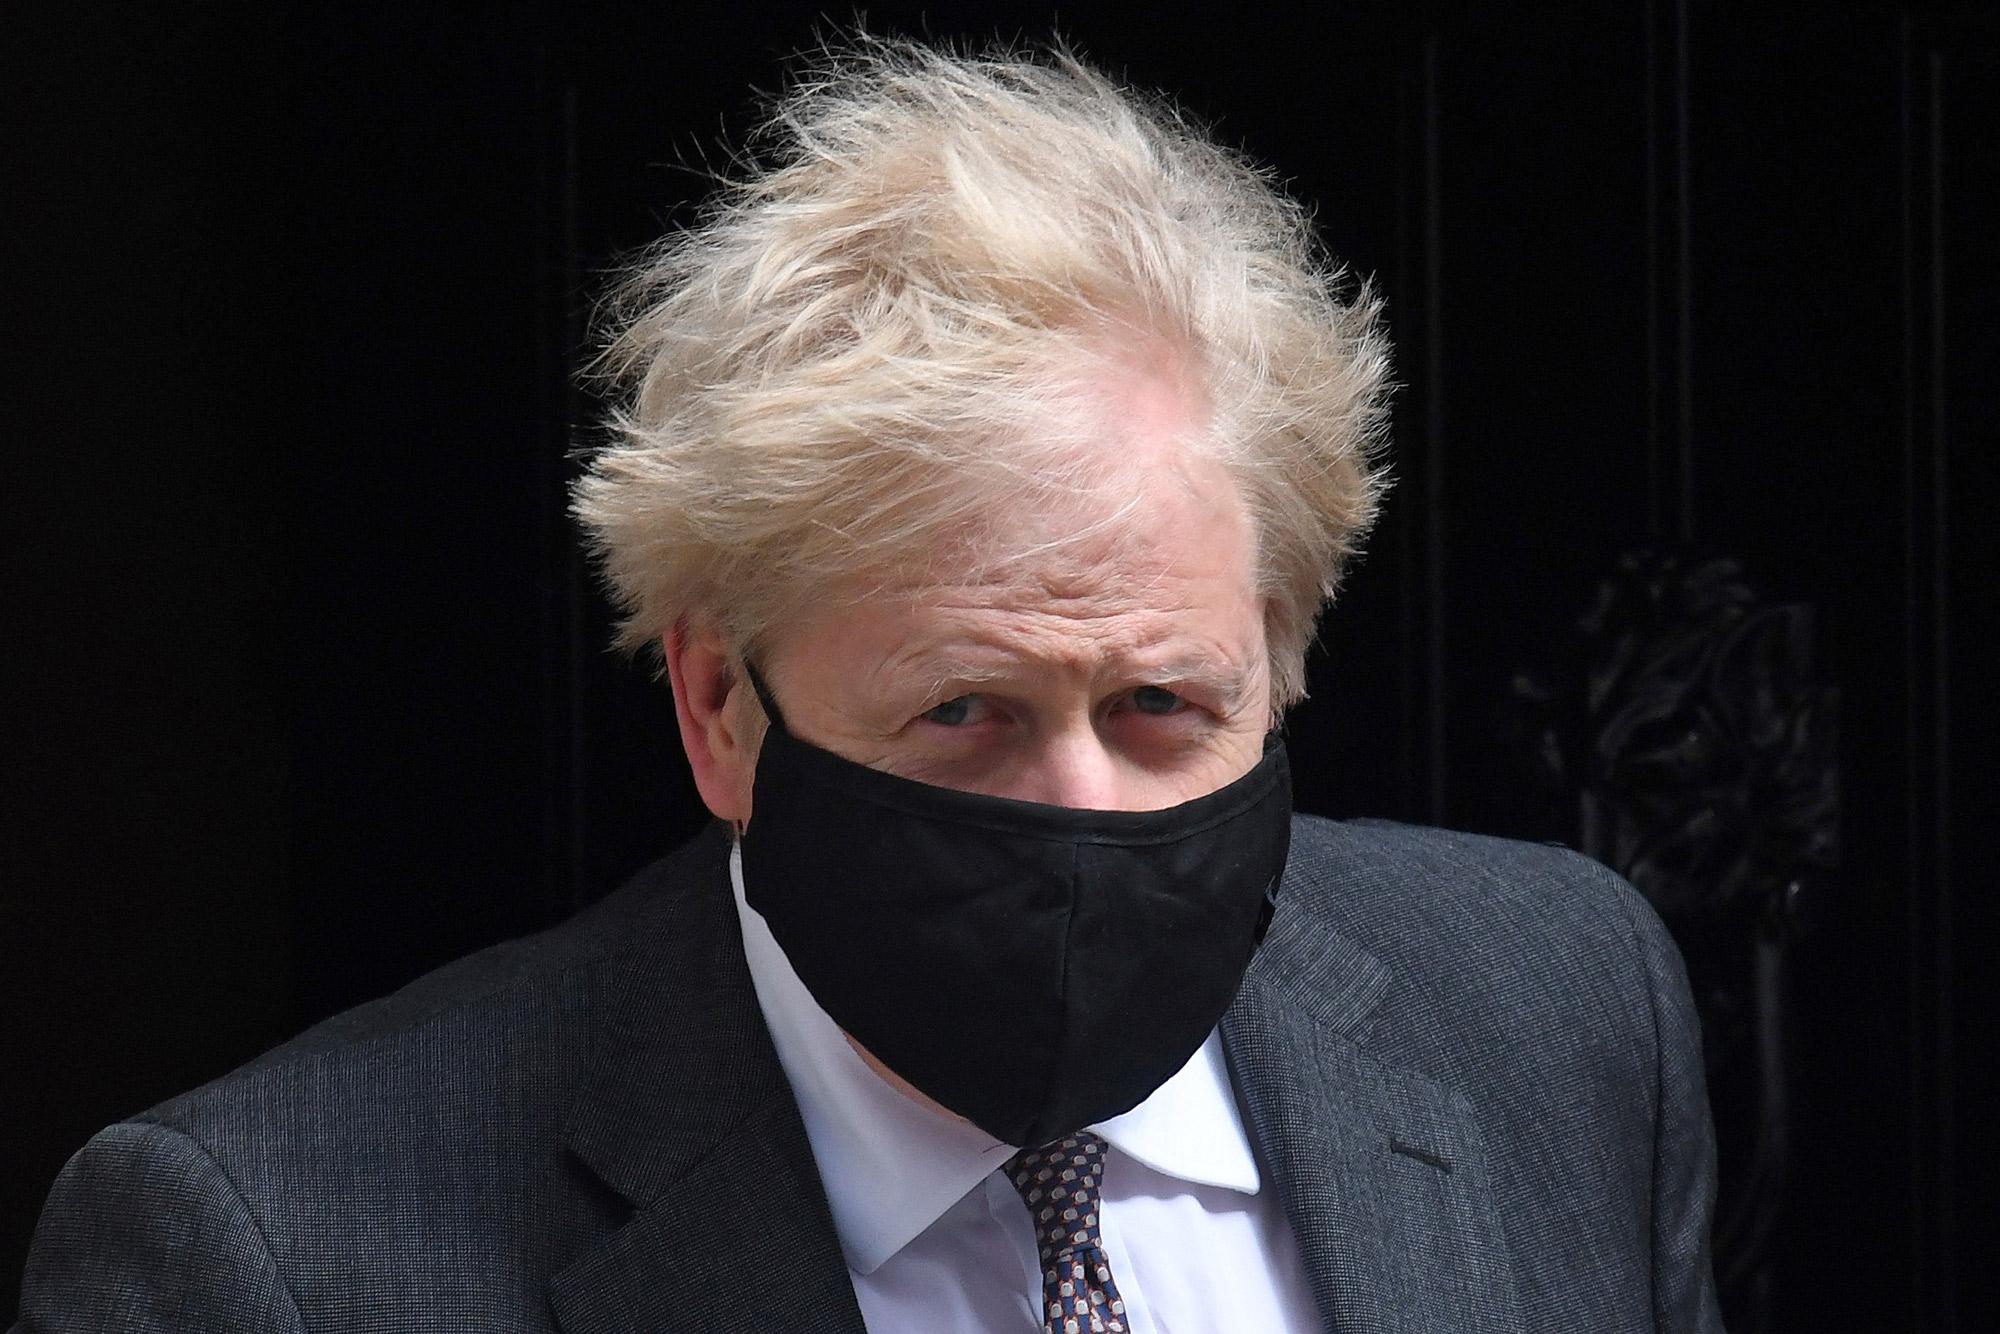 Britain's Prime Minister Boris Johnson leaves 10 Downing Street in London on April 21.